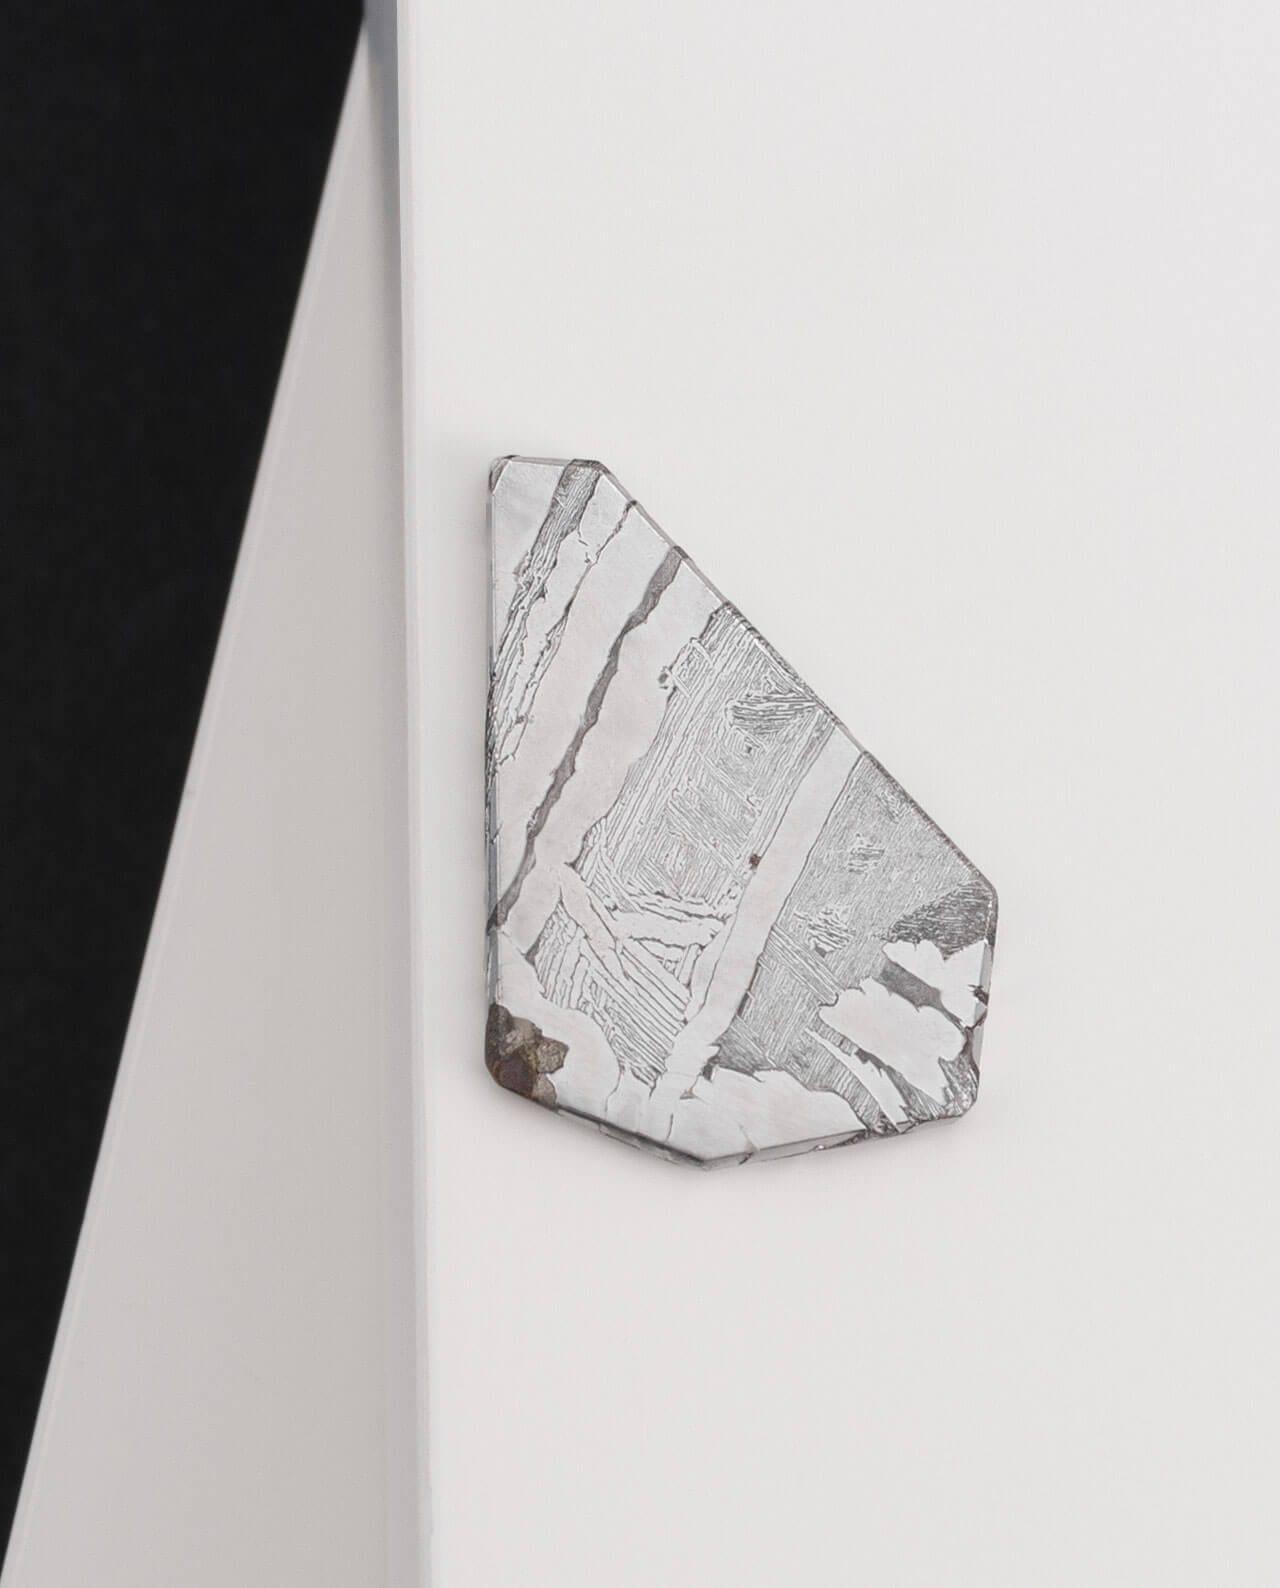 CONLIGHT Seymchan Meteorite Iron 2E